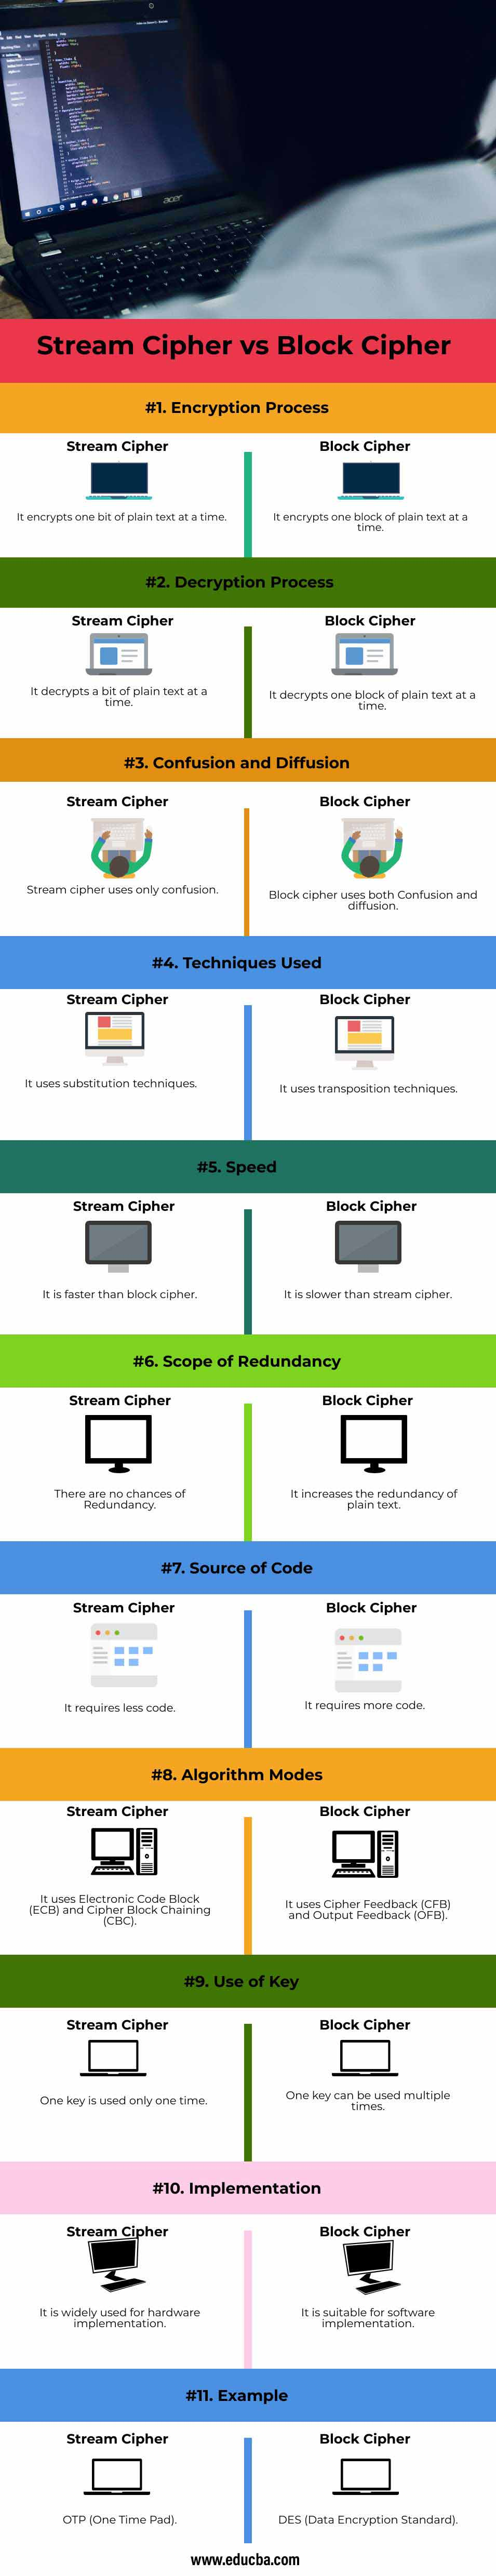 Stream Cipher vs Block Cipher info